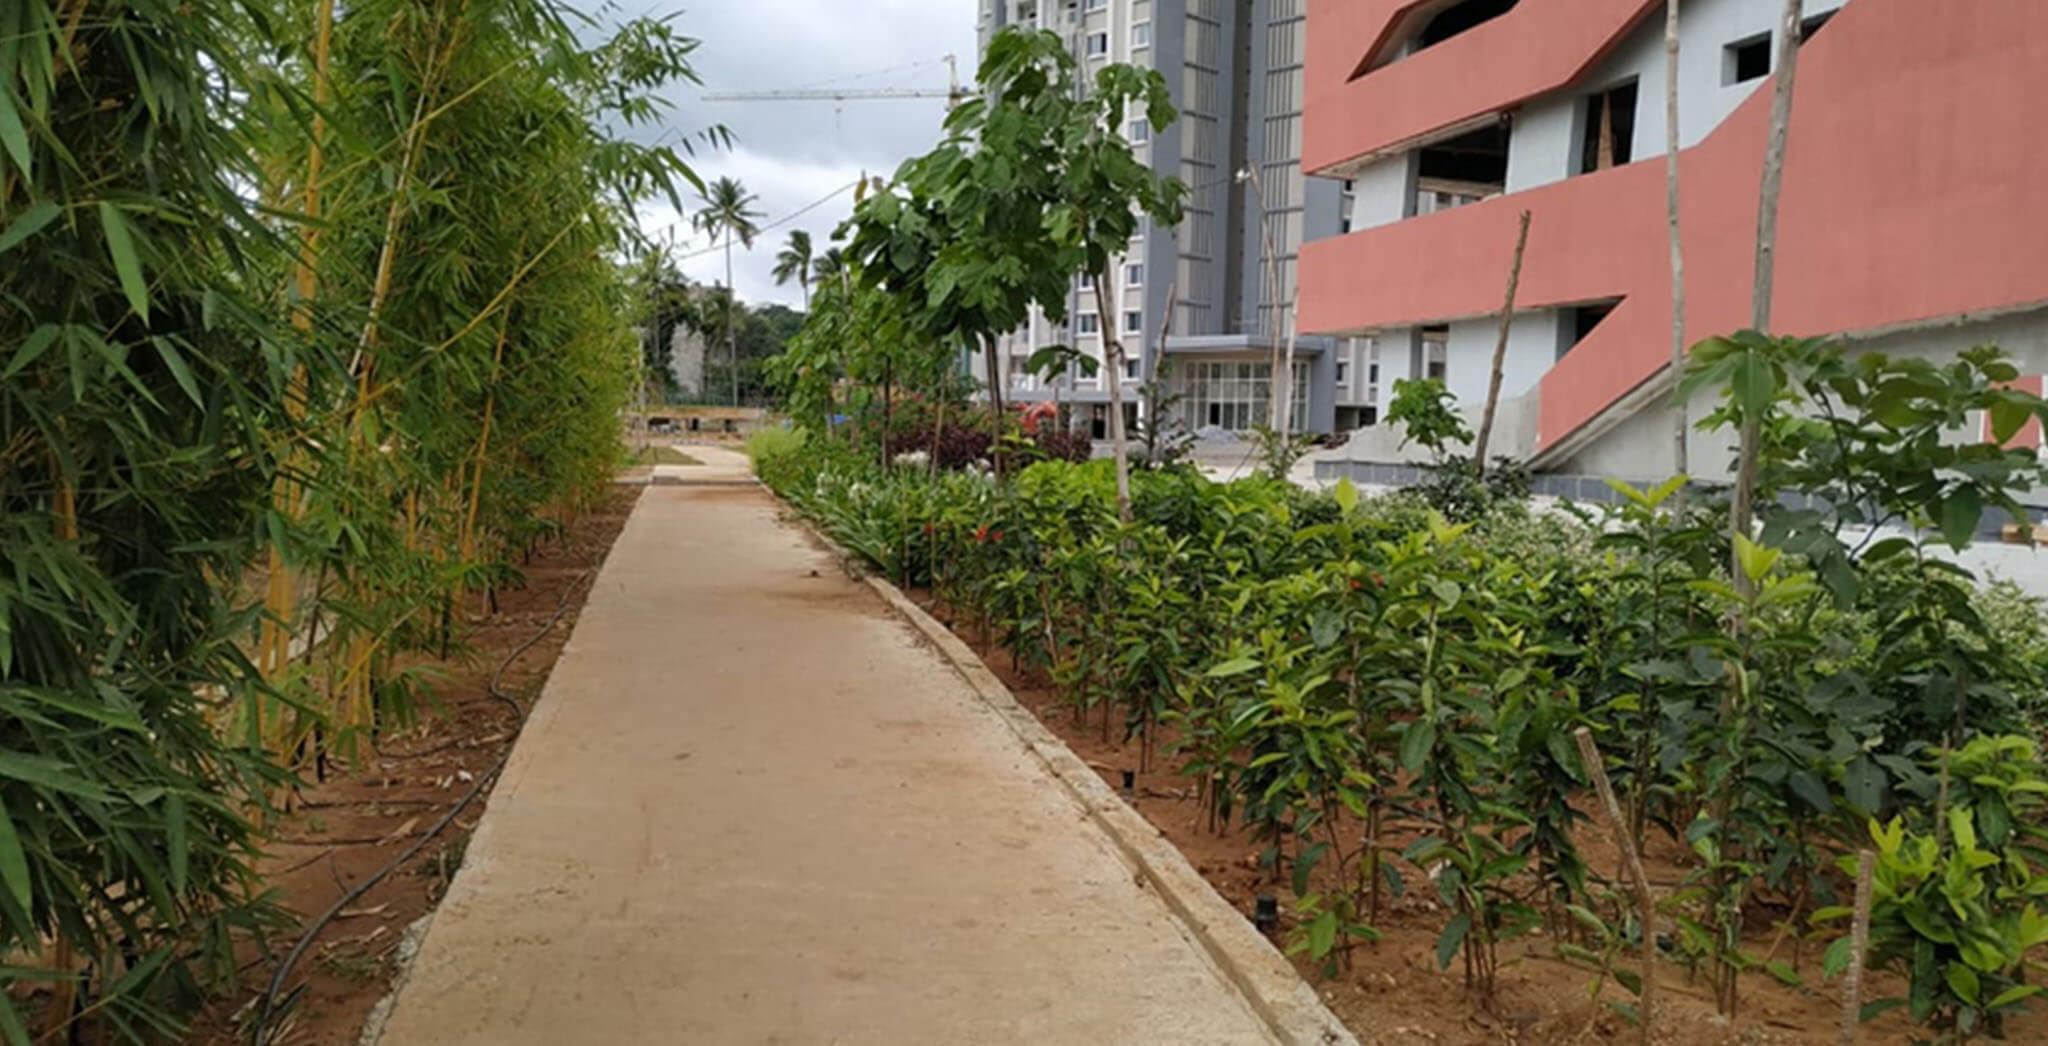 Jul 2020 - Entrance Landscaping in progress